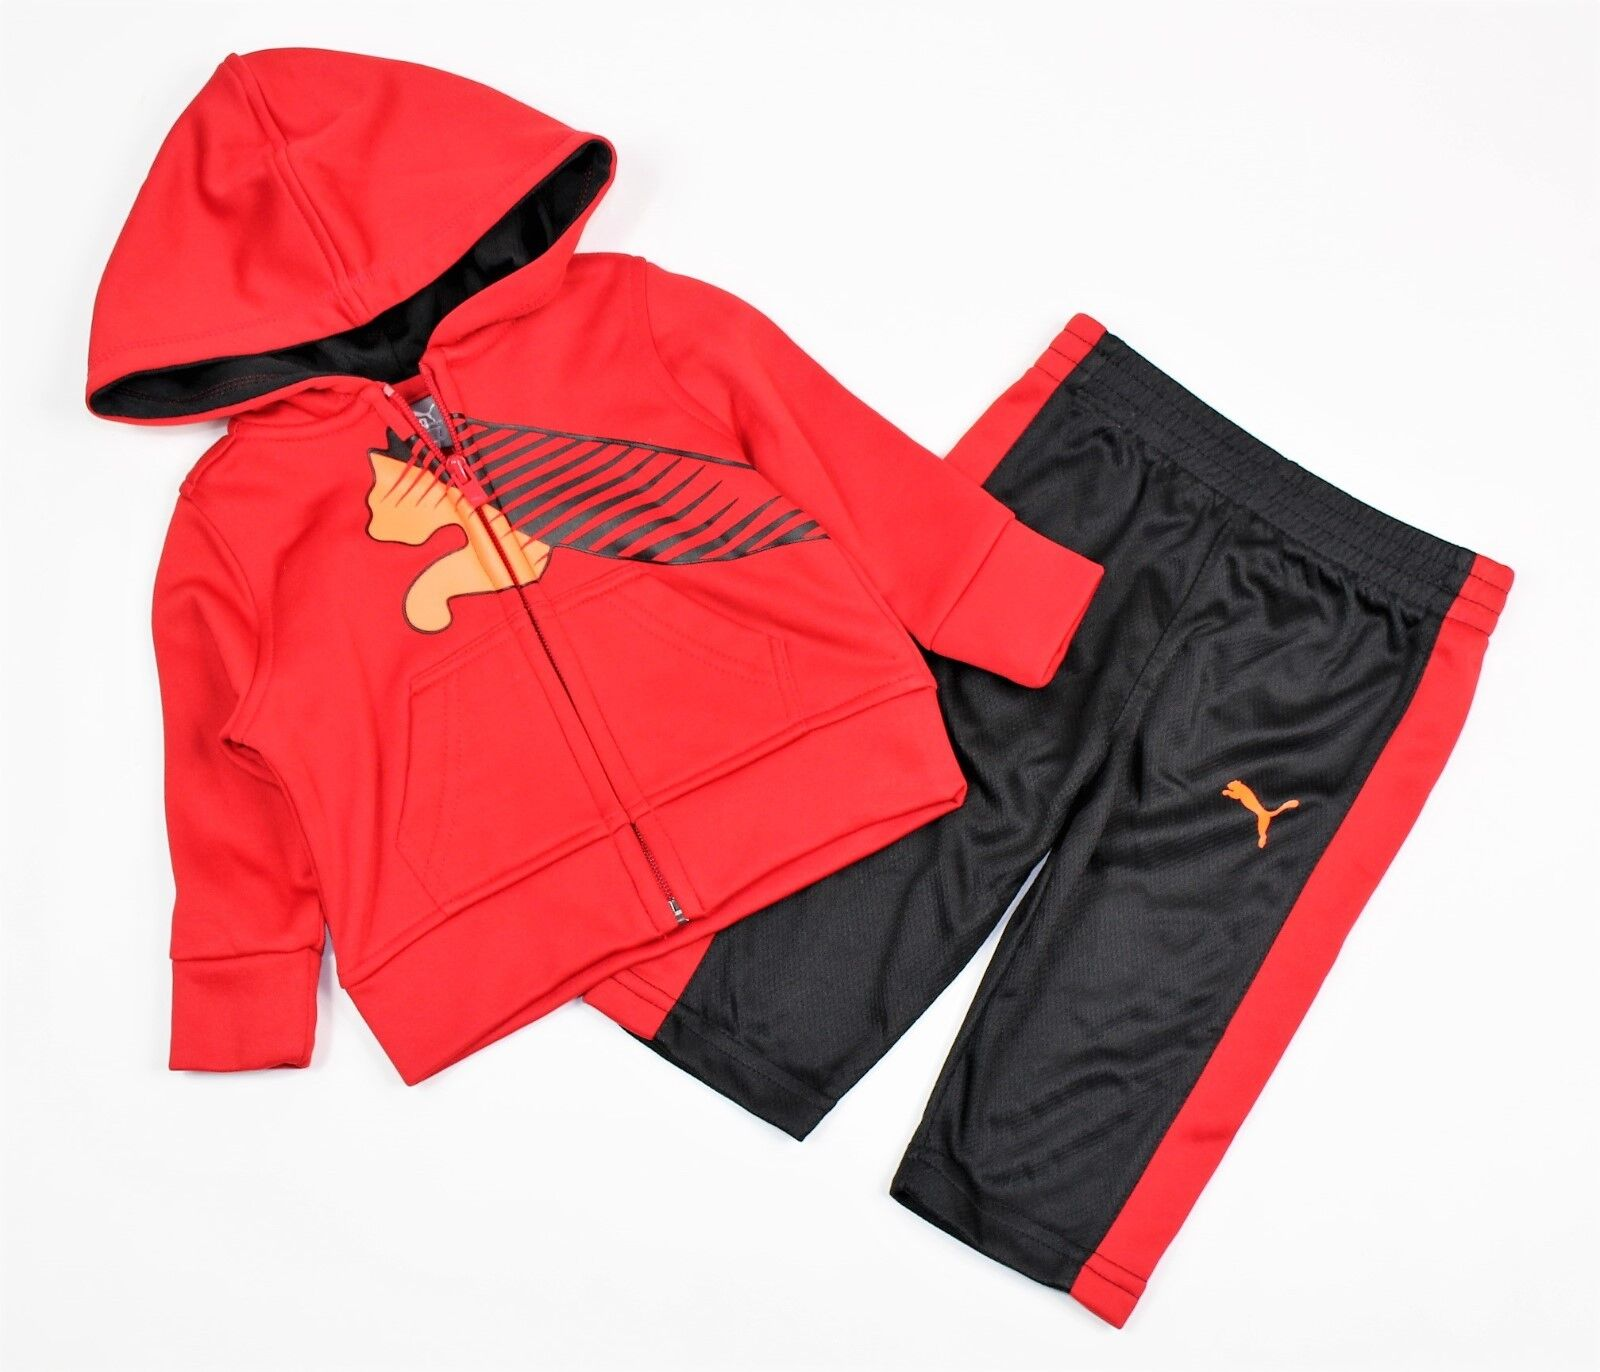 Puma Baby Boy 2 Piece Set Hoody Pant Suit Red Black Sizes: 0